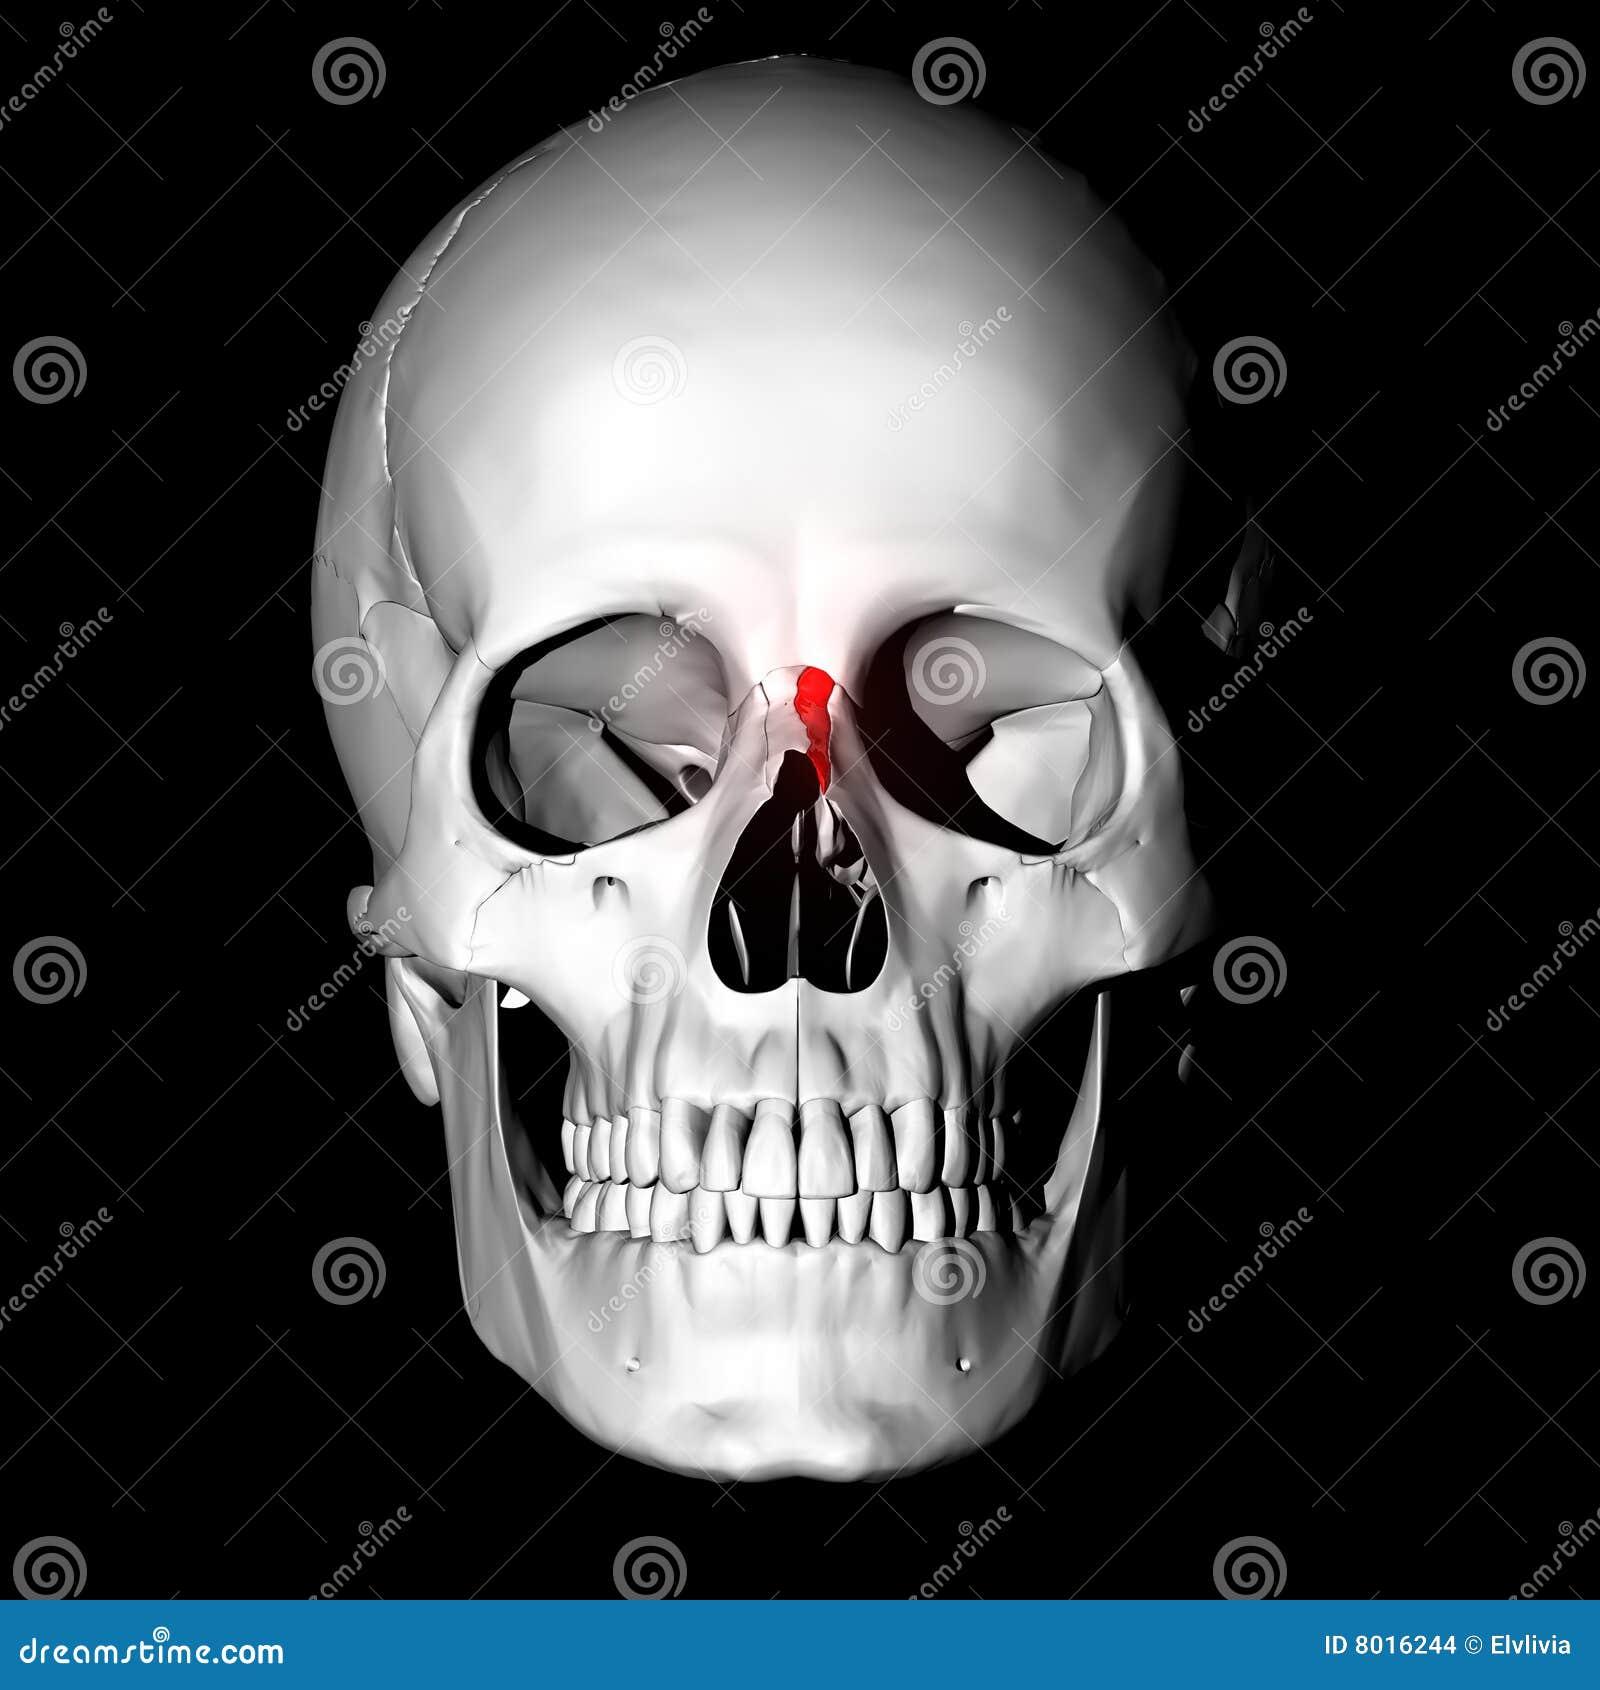 Nasal bone stock illustration. Illustration of bones, skulls - 8016244